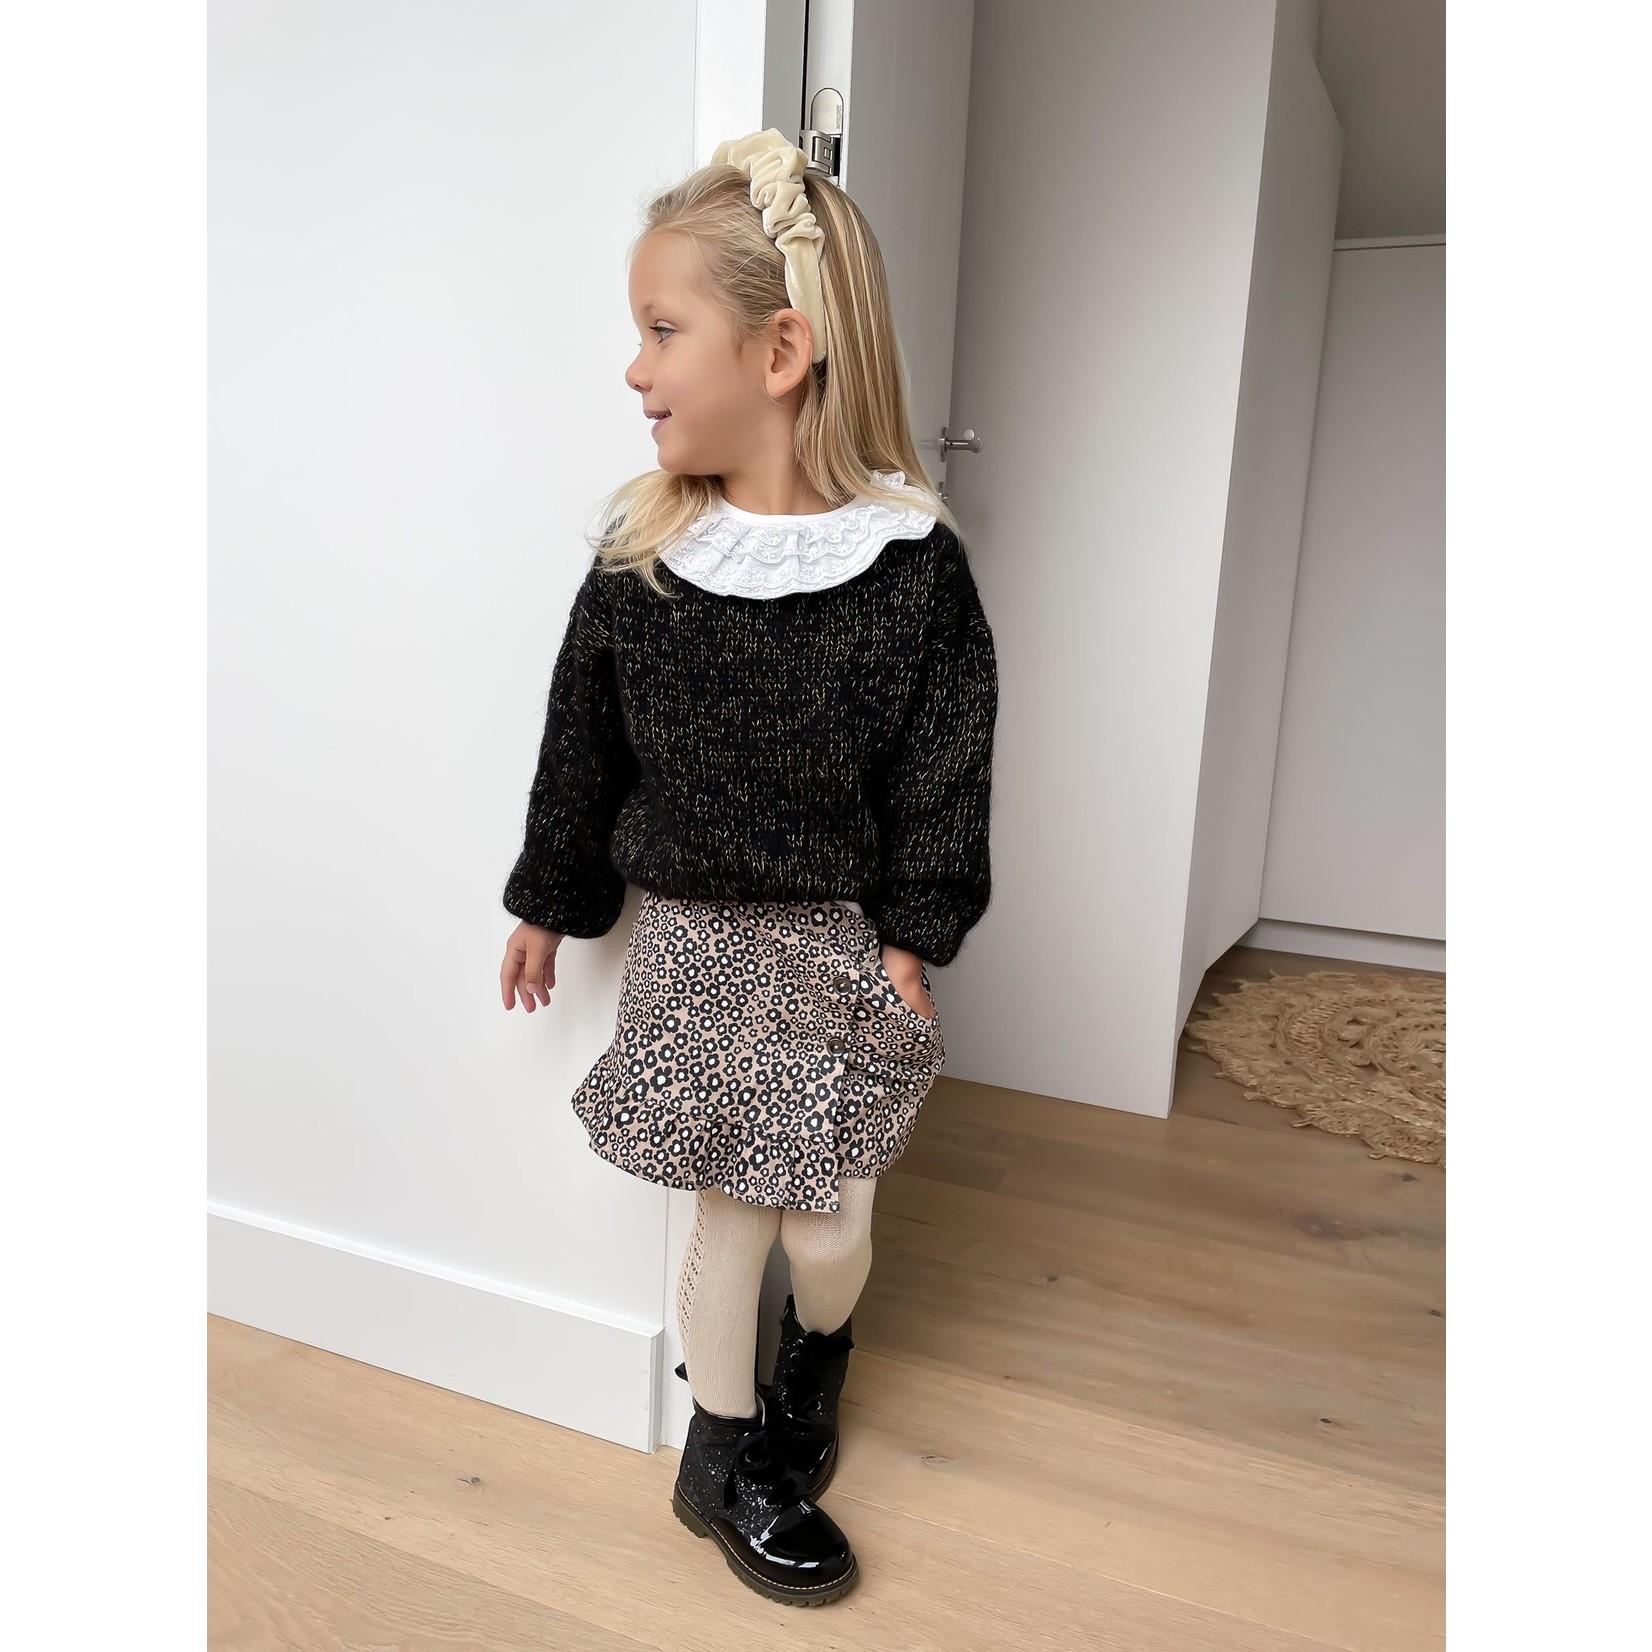 Petite Zara Sweater Black - Golden